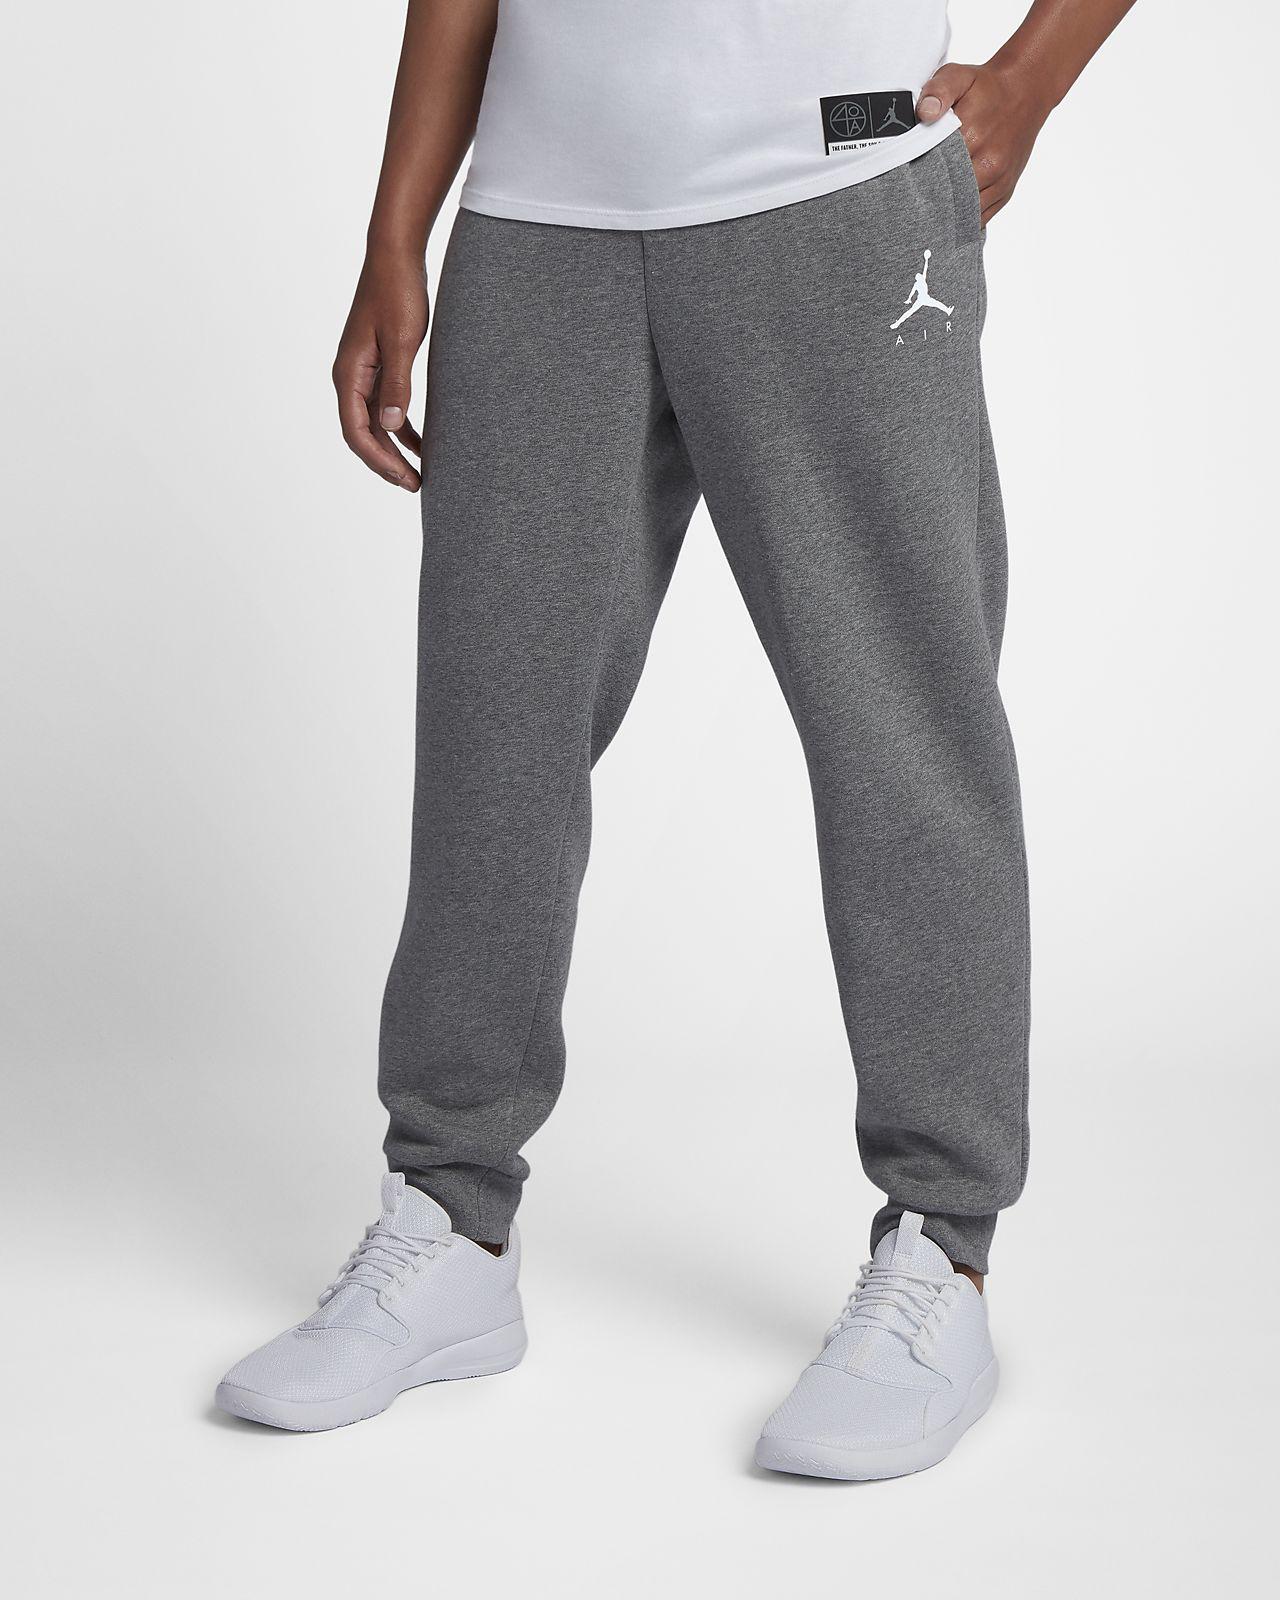 pantalon nike air max xl carbonne